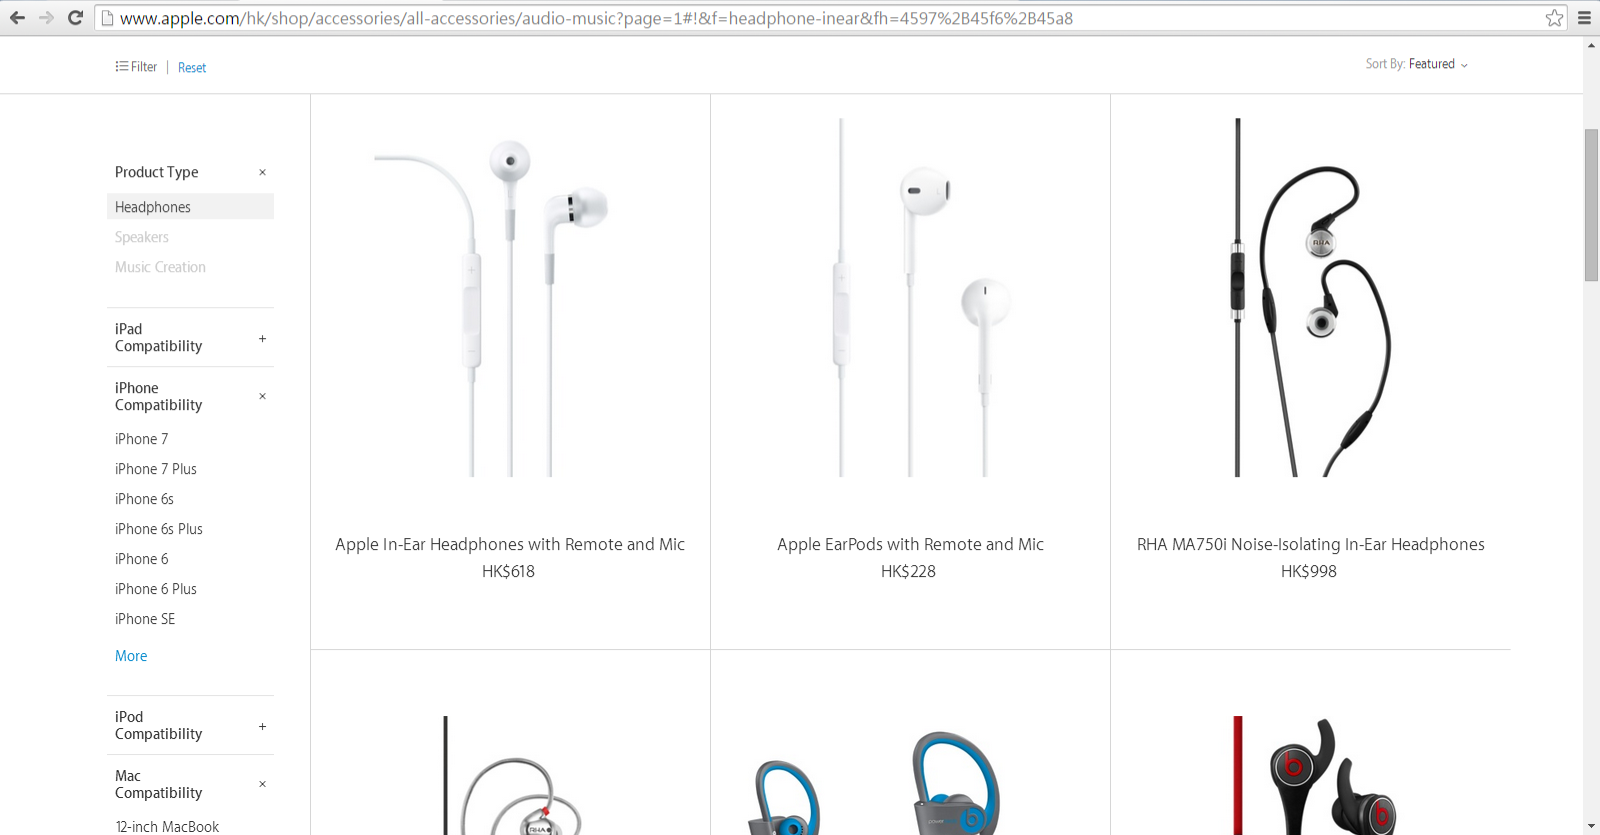 iPhone 7 HK